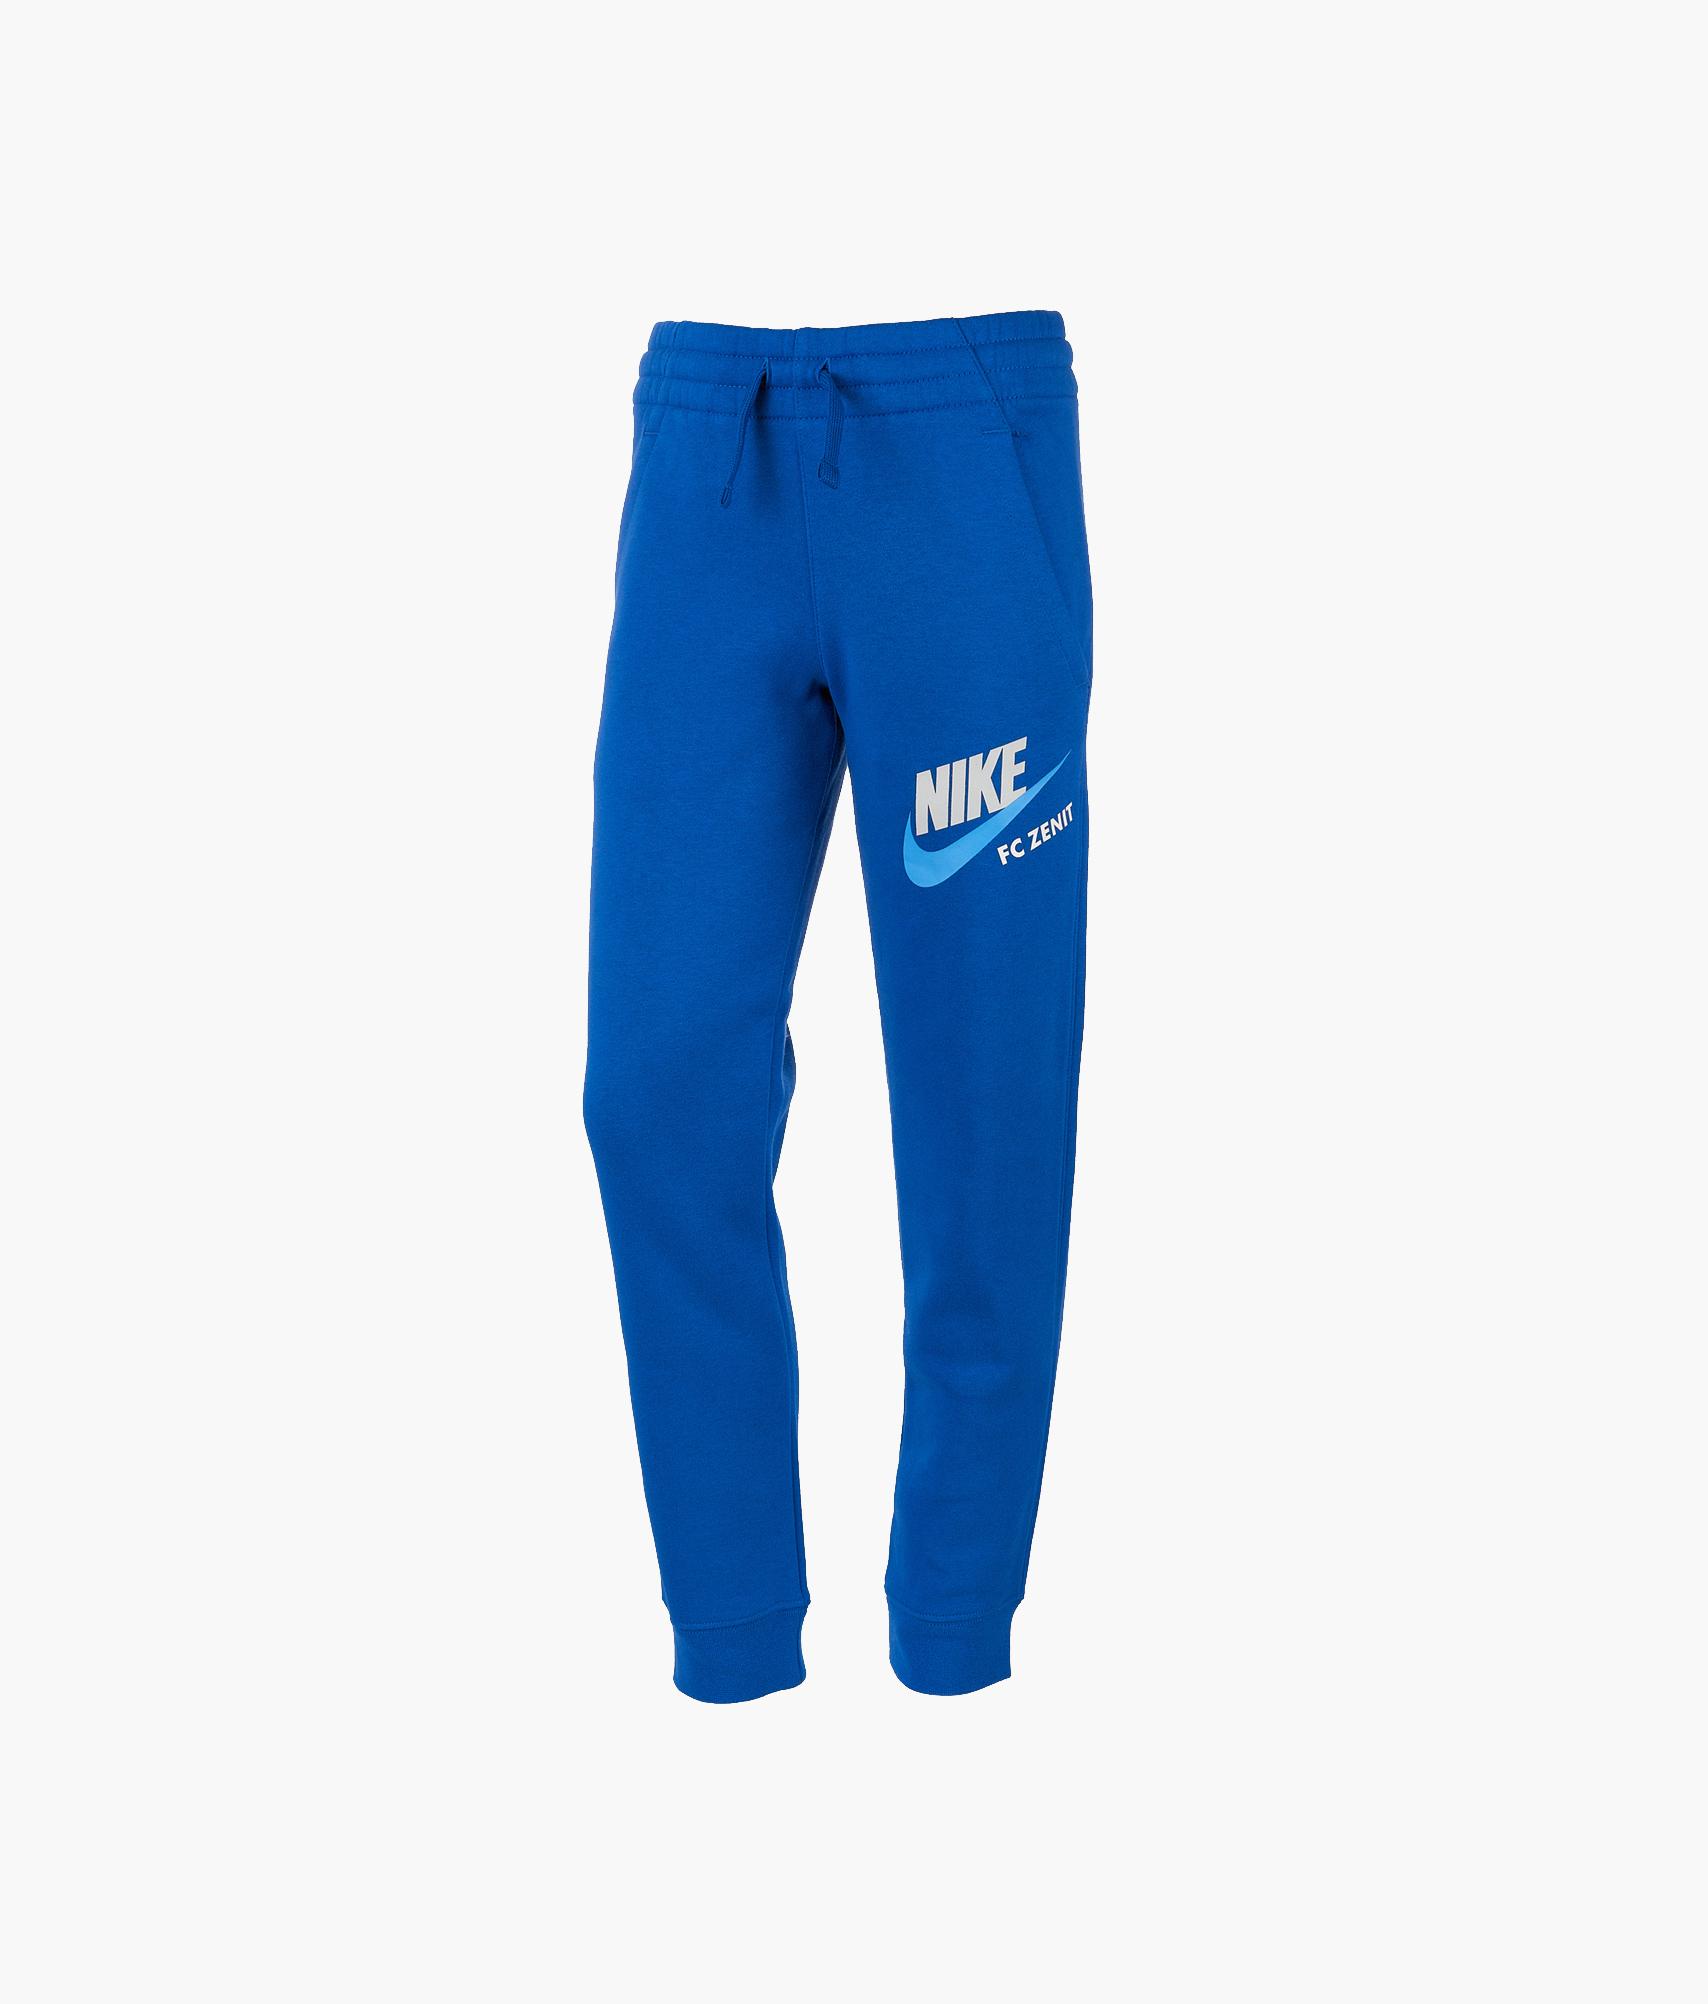 Брюки подростковые Nike Nike Цвет-Синий цена и фото